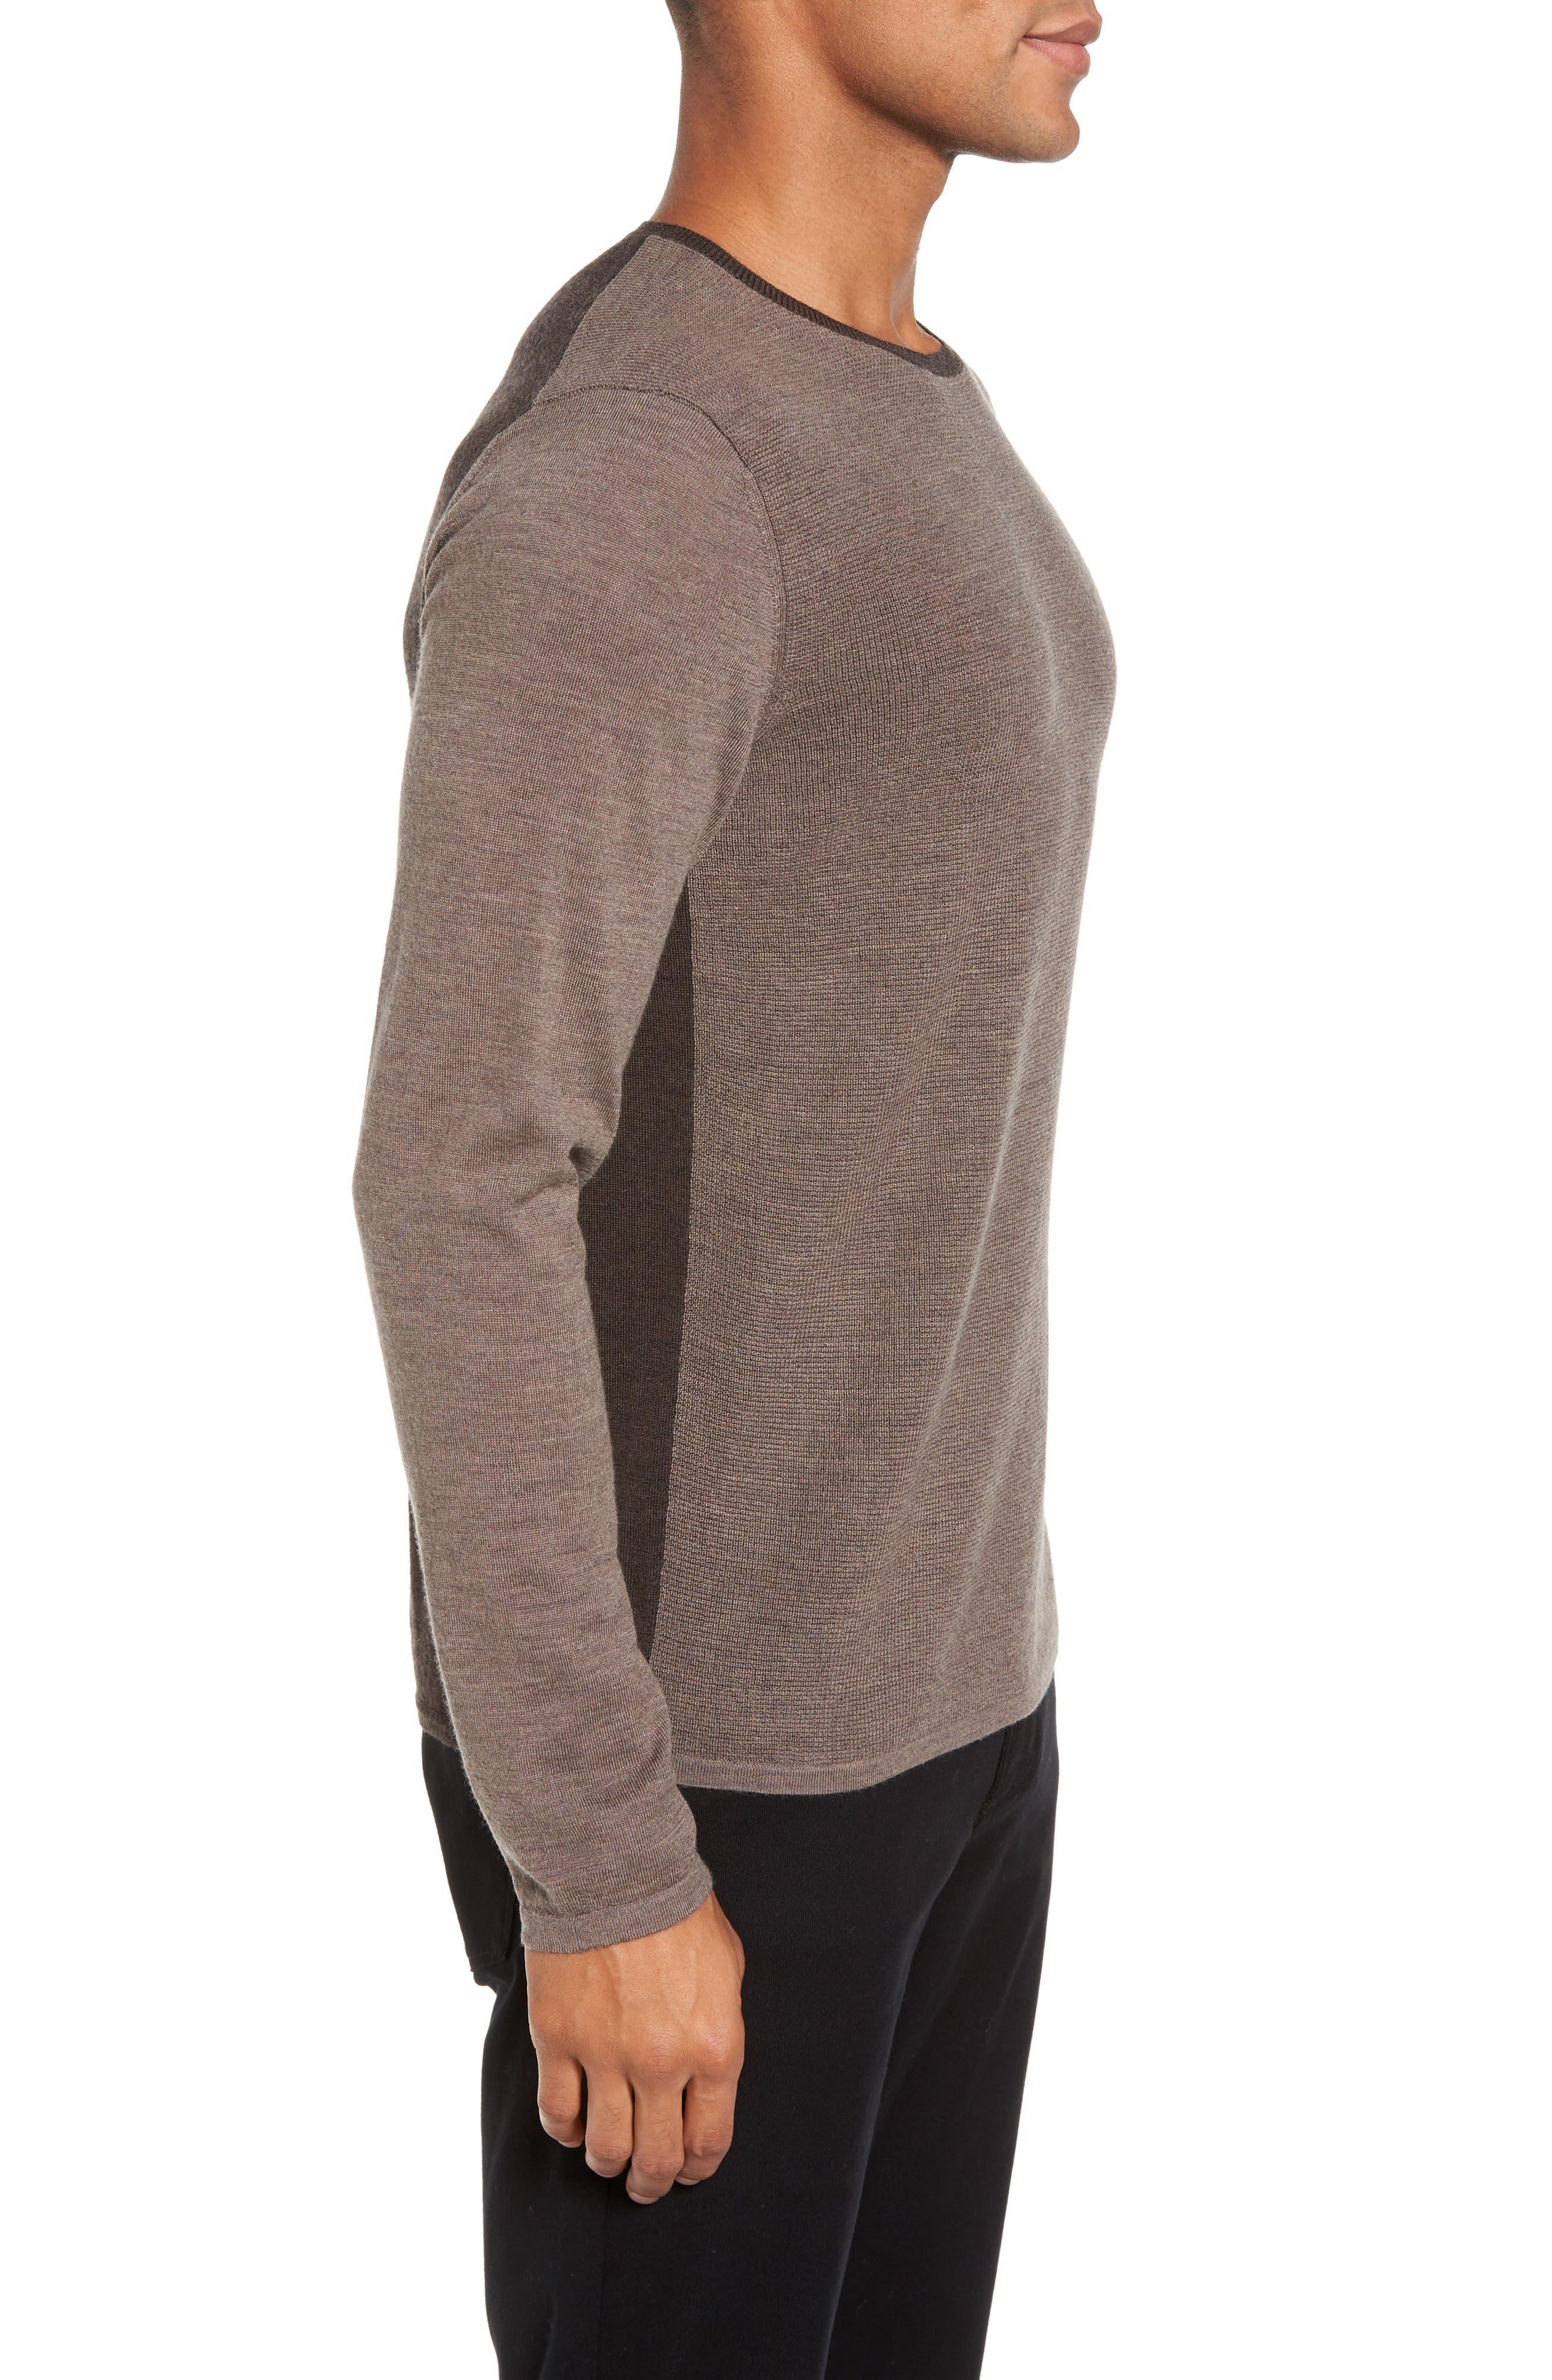 Huxley Merino Sweater,                             Alternate thumbnail 3, color,                             LIGHT COFFEE